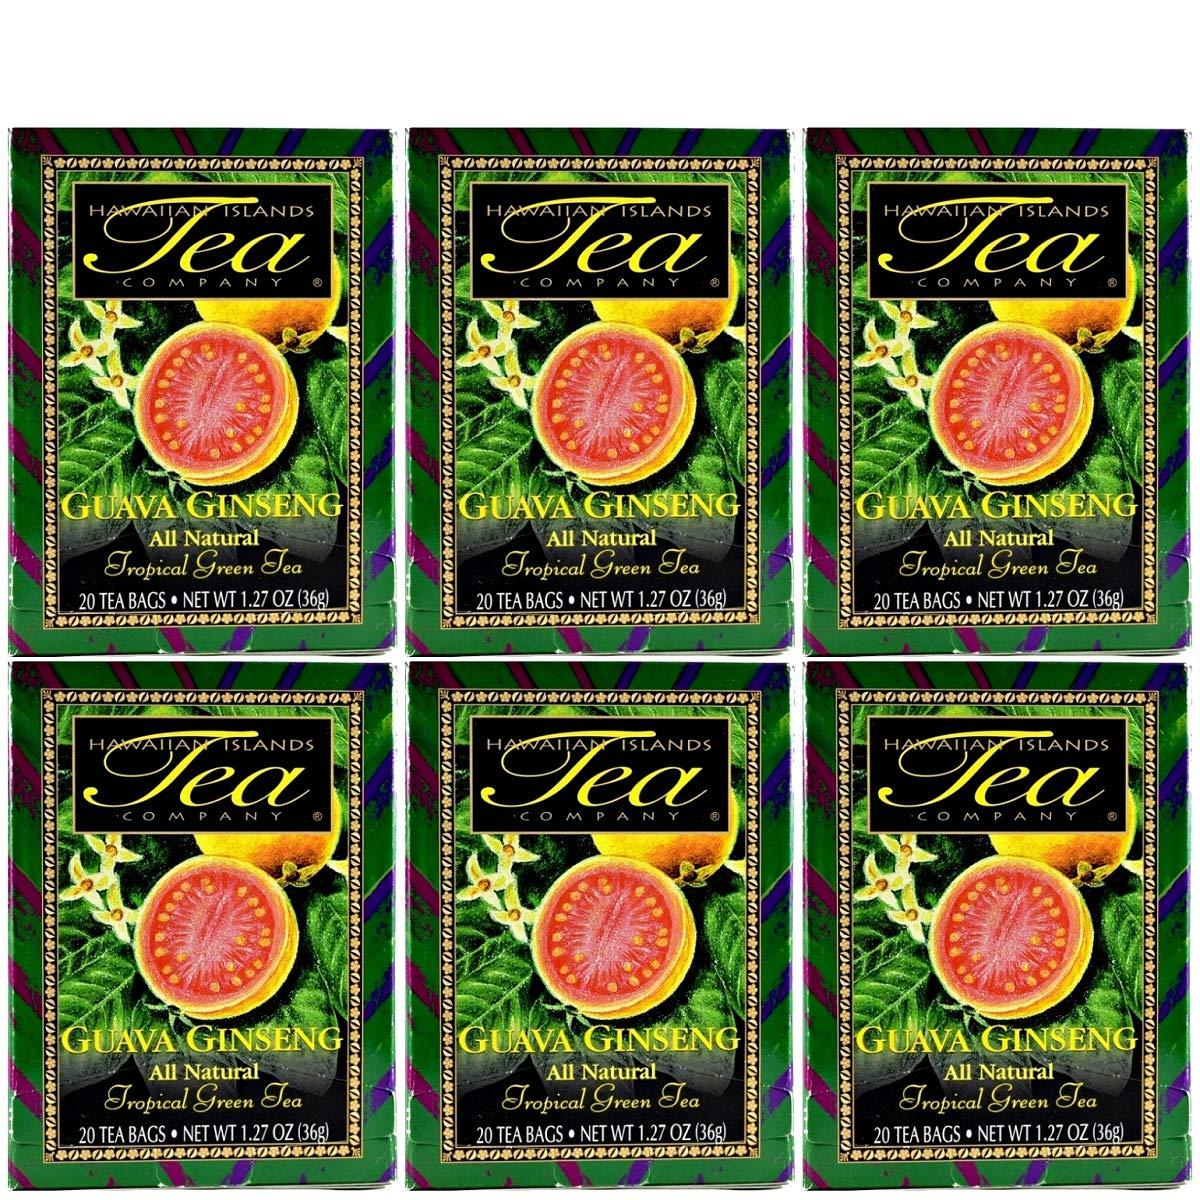 Hawaiian Islands Guava Ginseng Tropical Green Tea, All Natural - 20 Teabags Per Box (Pack of Six)